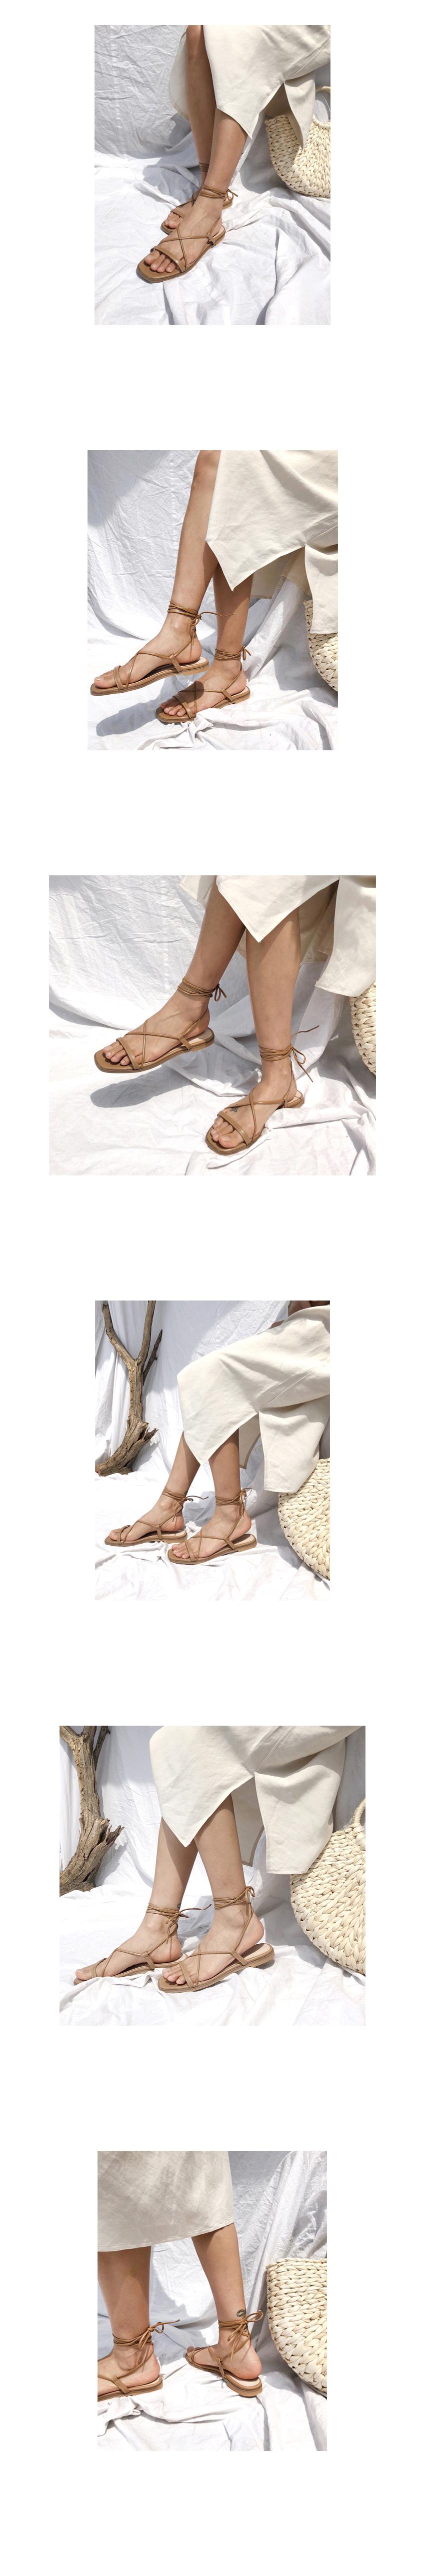 Wayne strap sandals